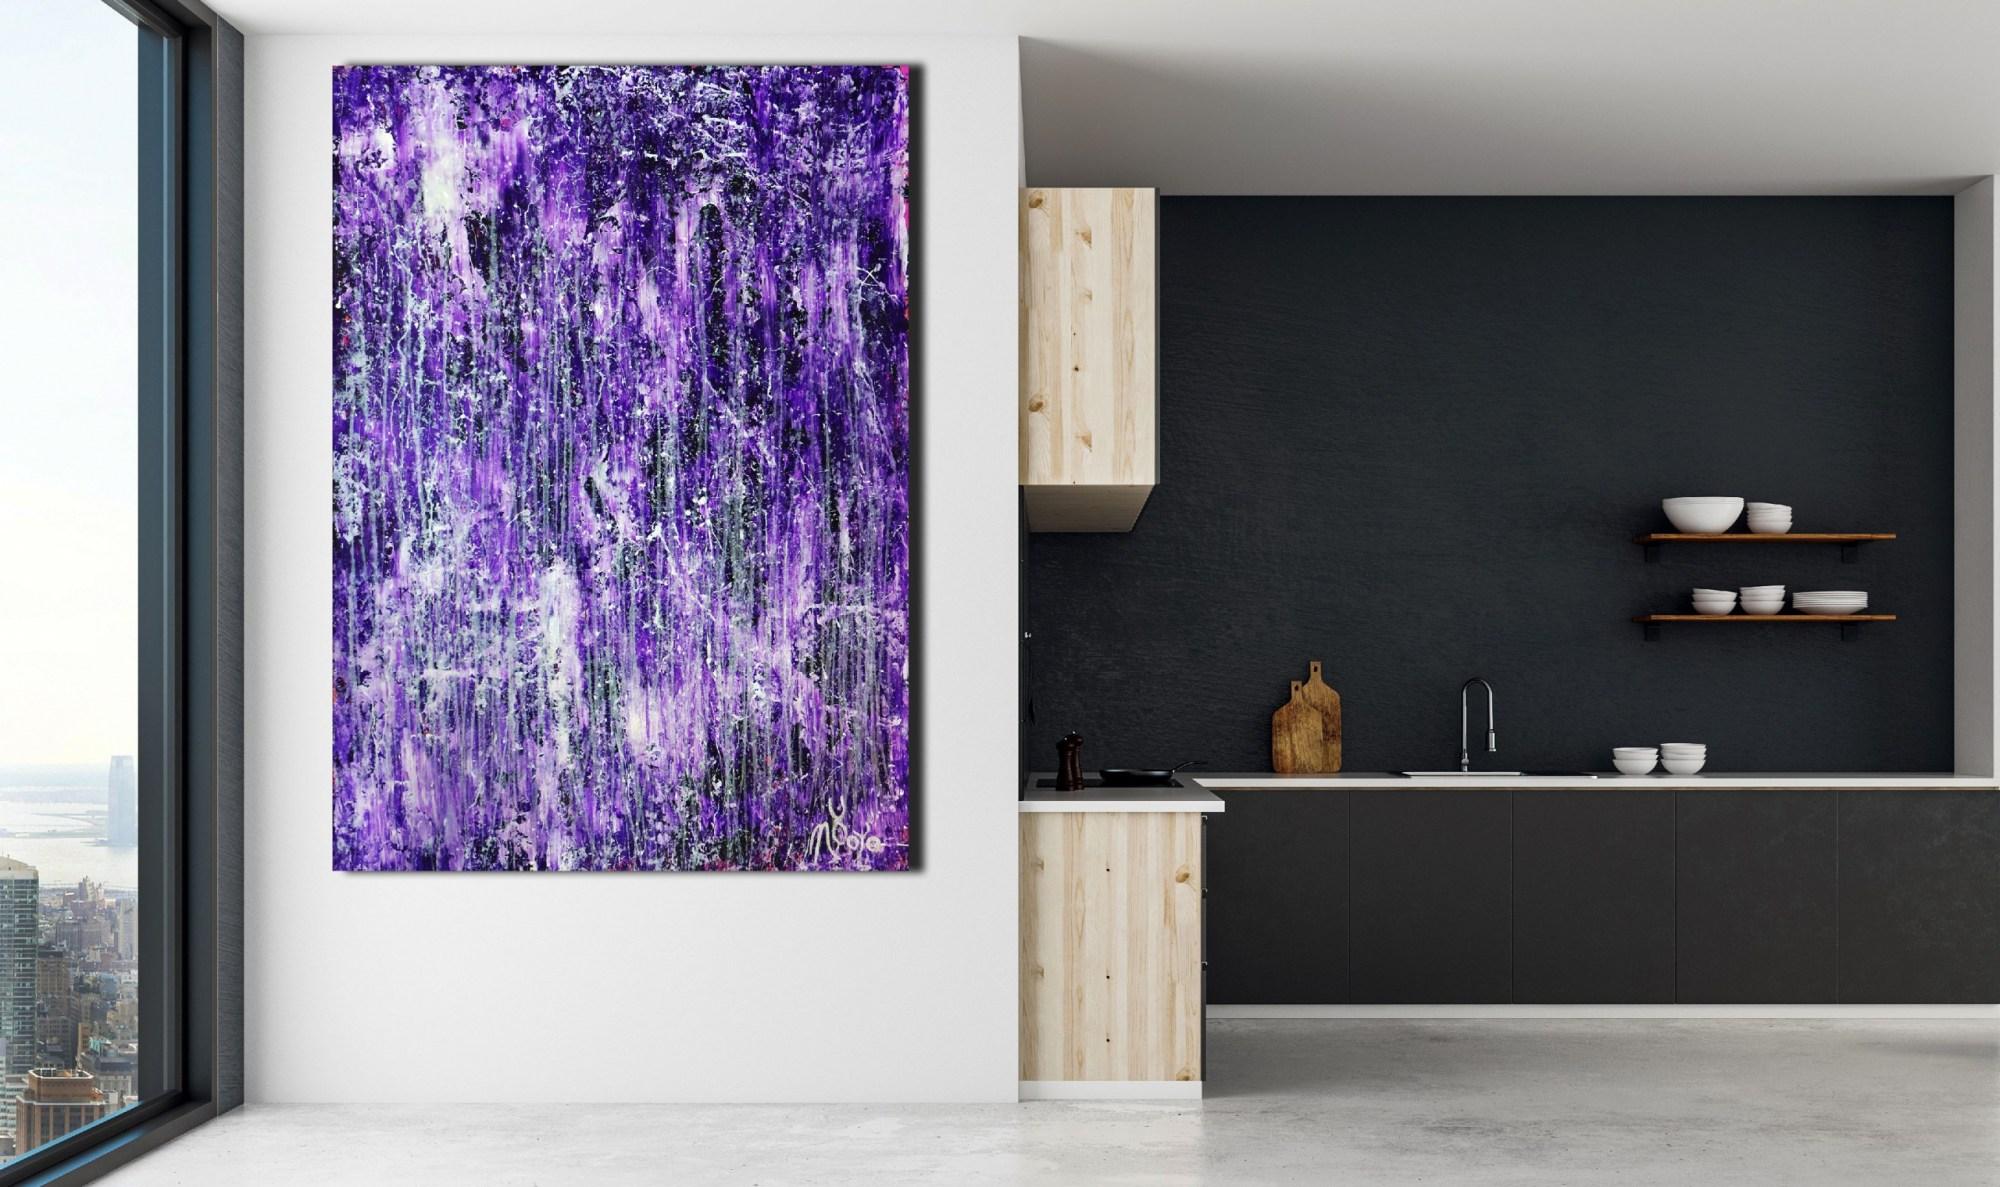 Room View - Rapid Iridescent Cascades (Purple) (2020) by Nestor Toro